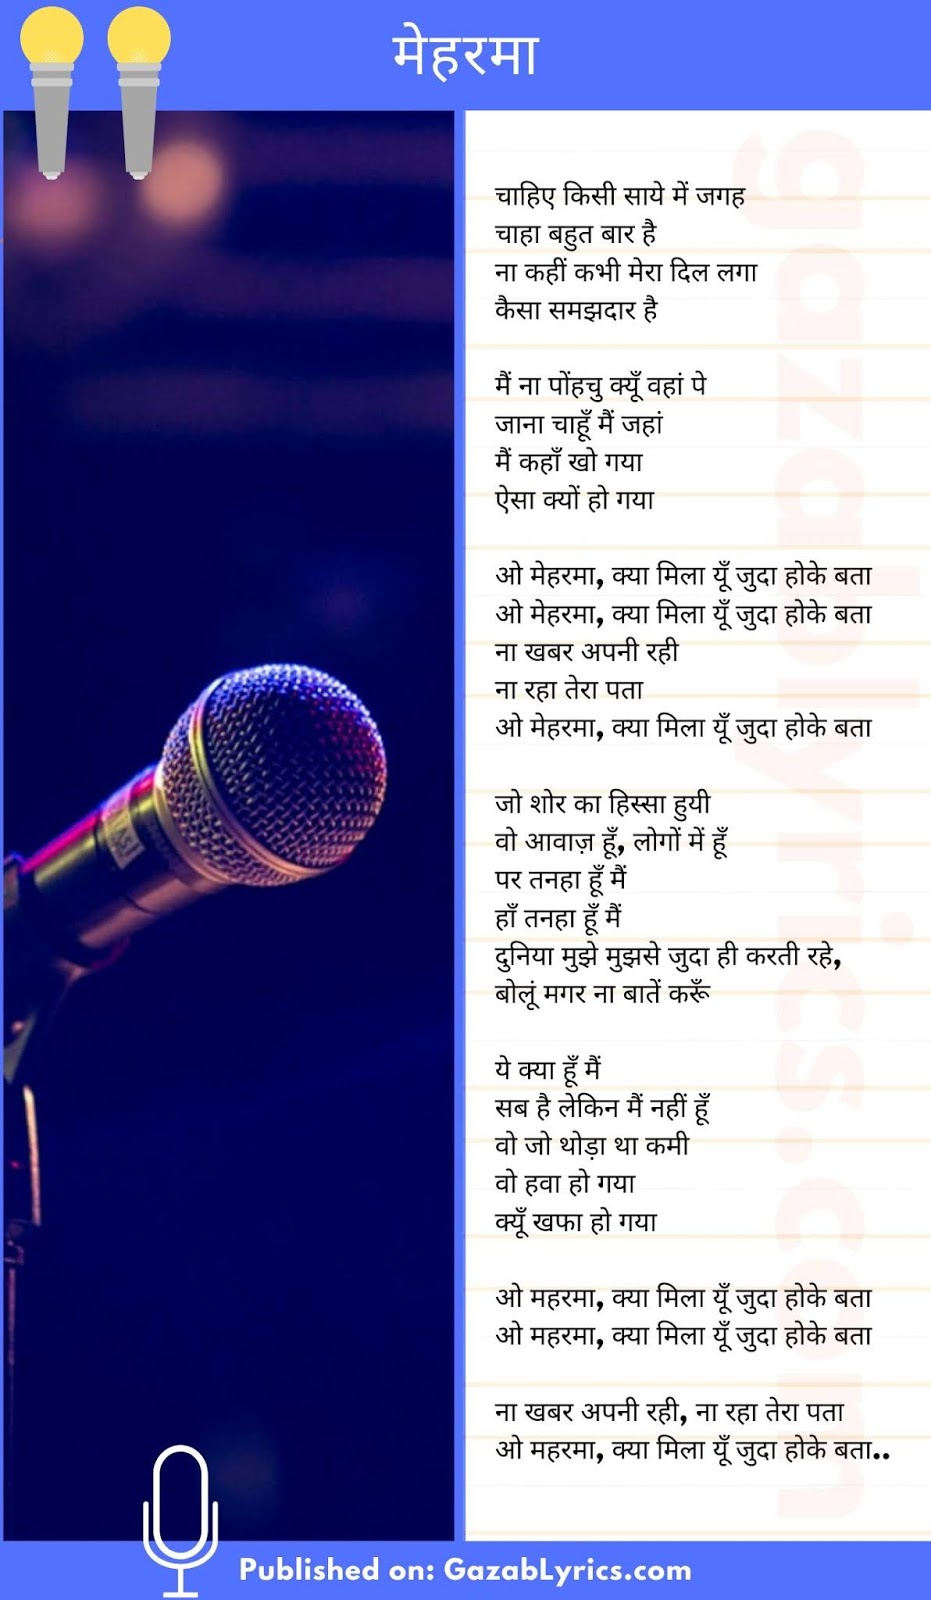 Mehrama song lyrics image